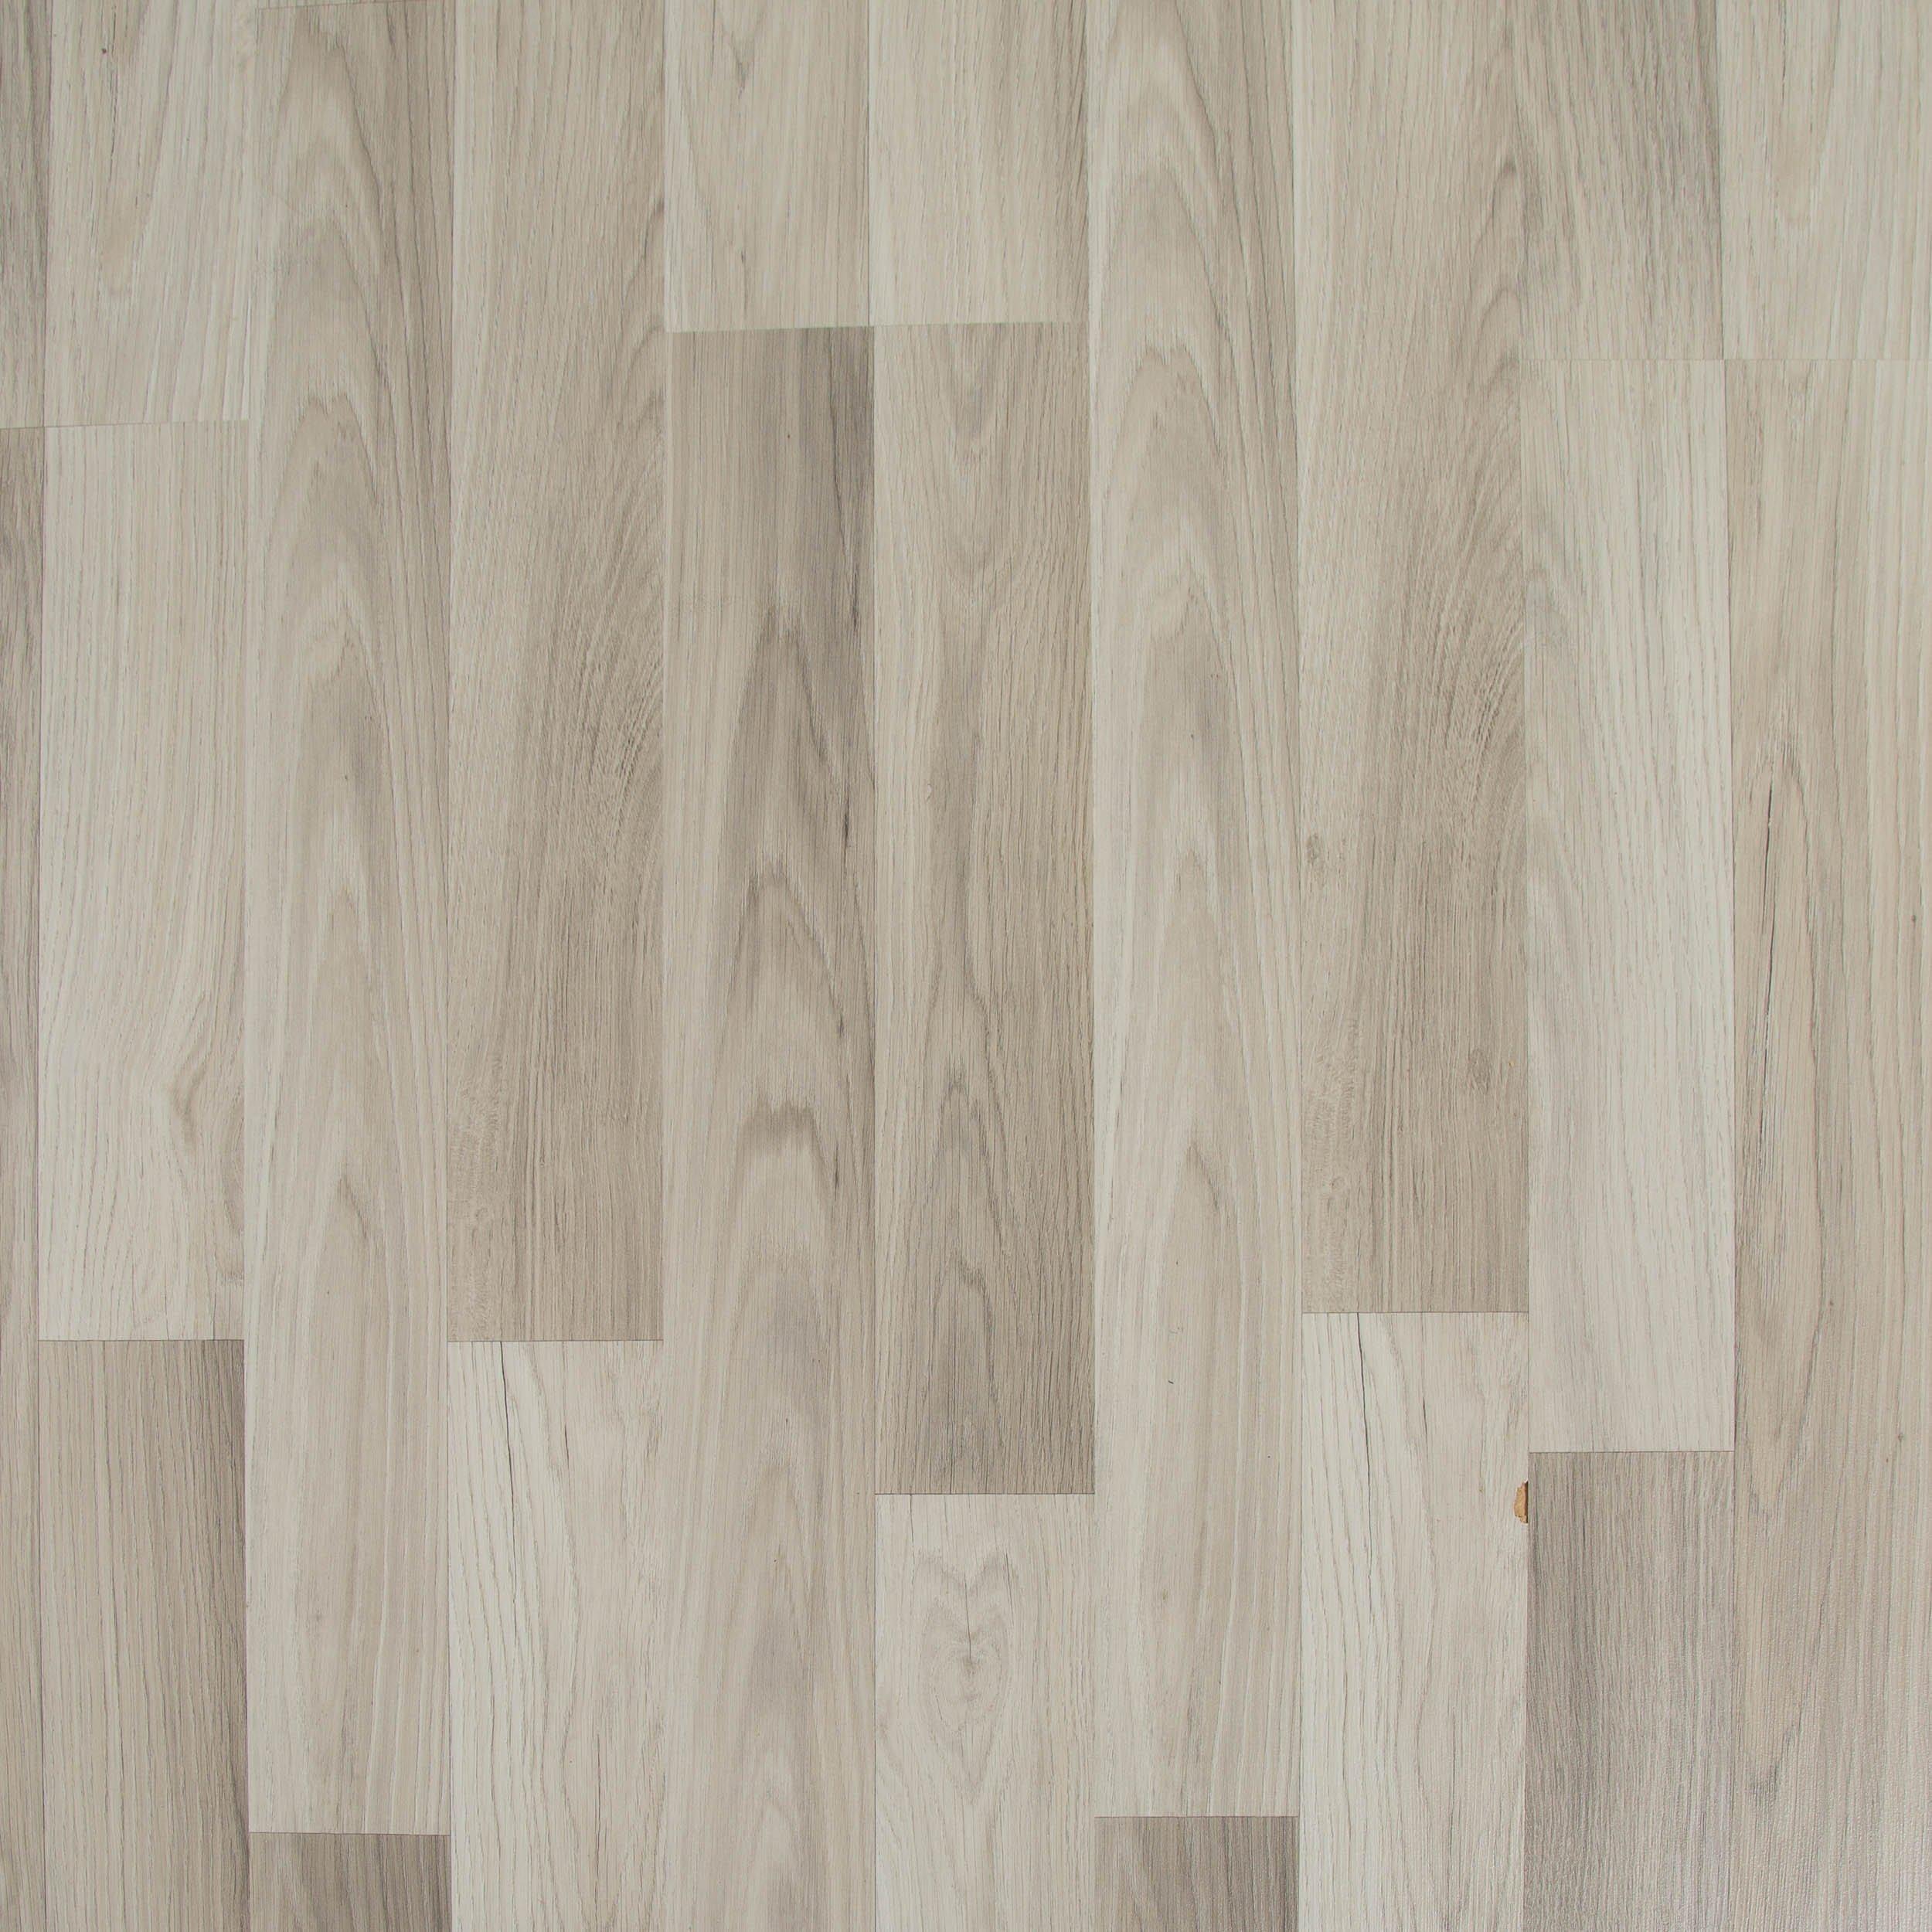 Fawn Oak 2 Strip Matte Laminate Oak Laminate Flooring Laminate Flooring Flooring